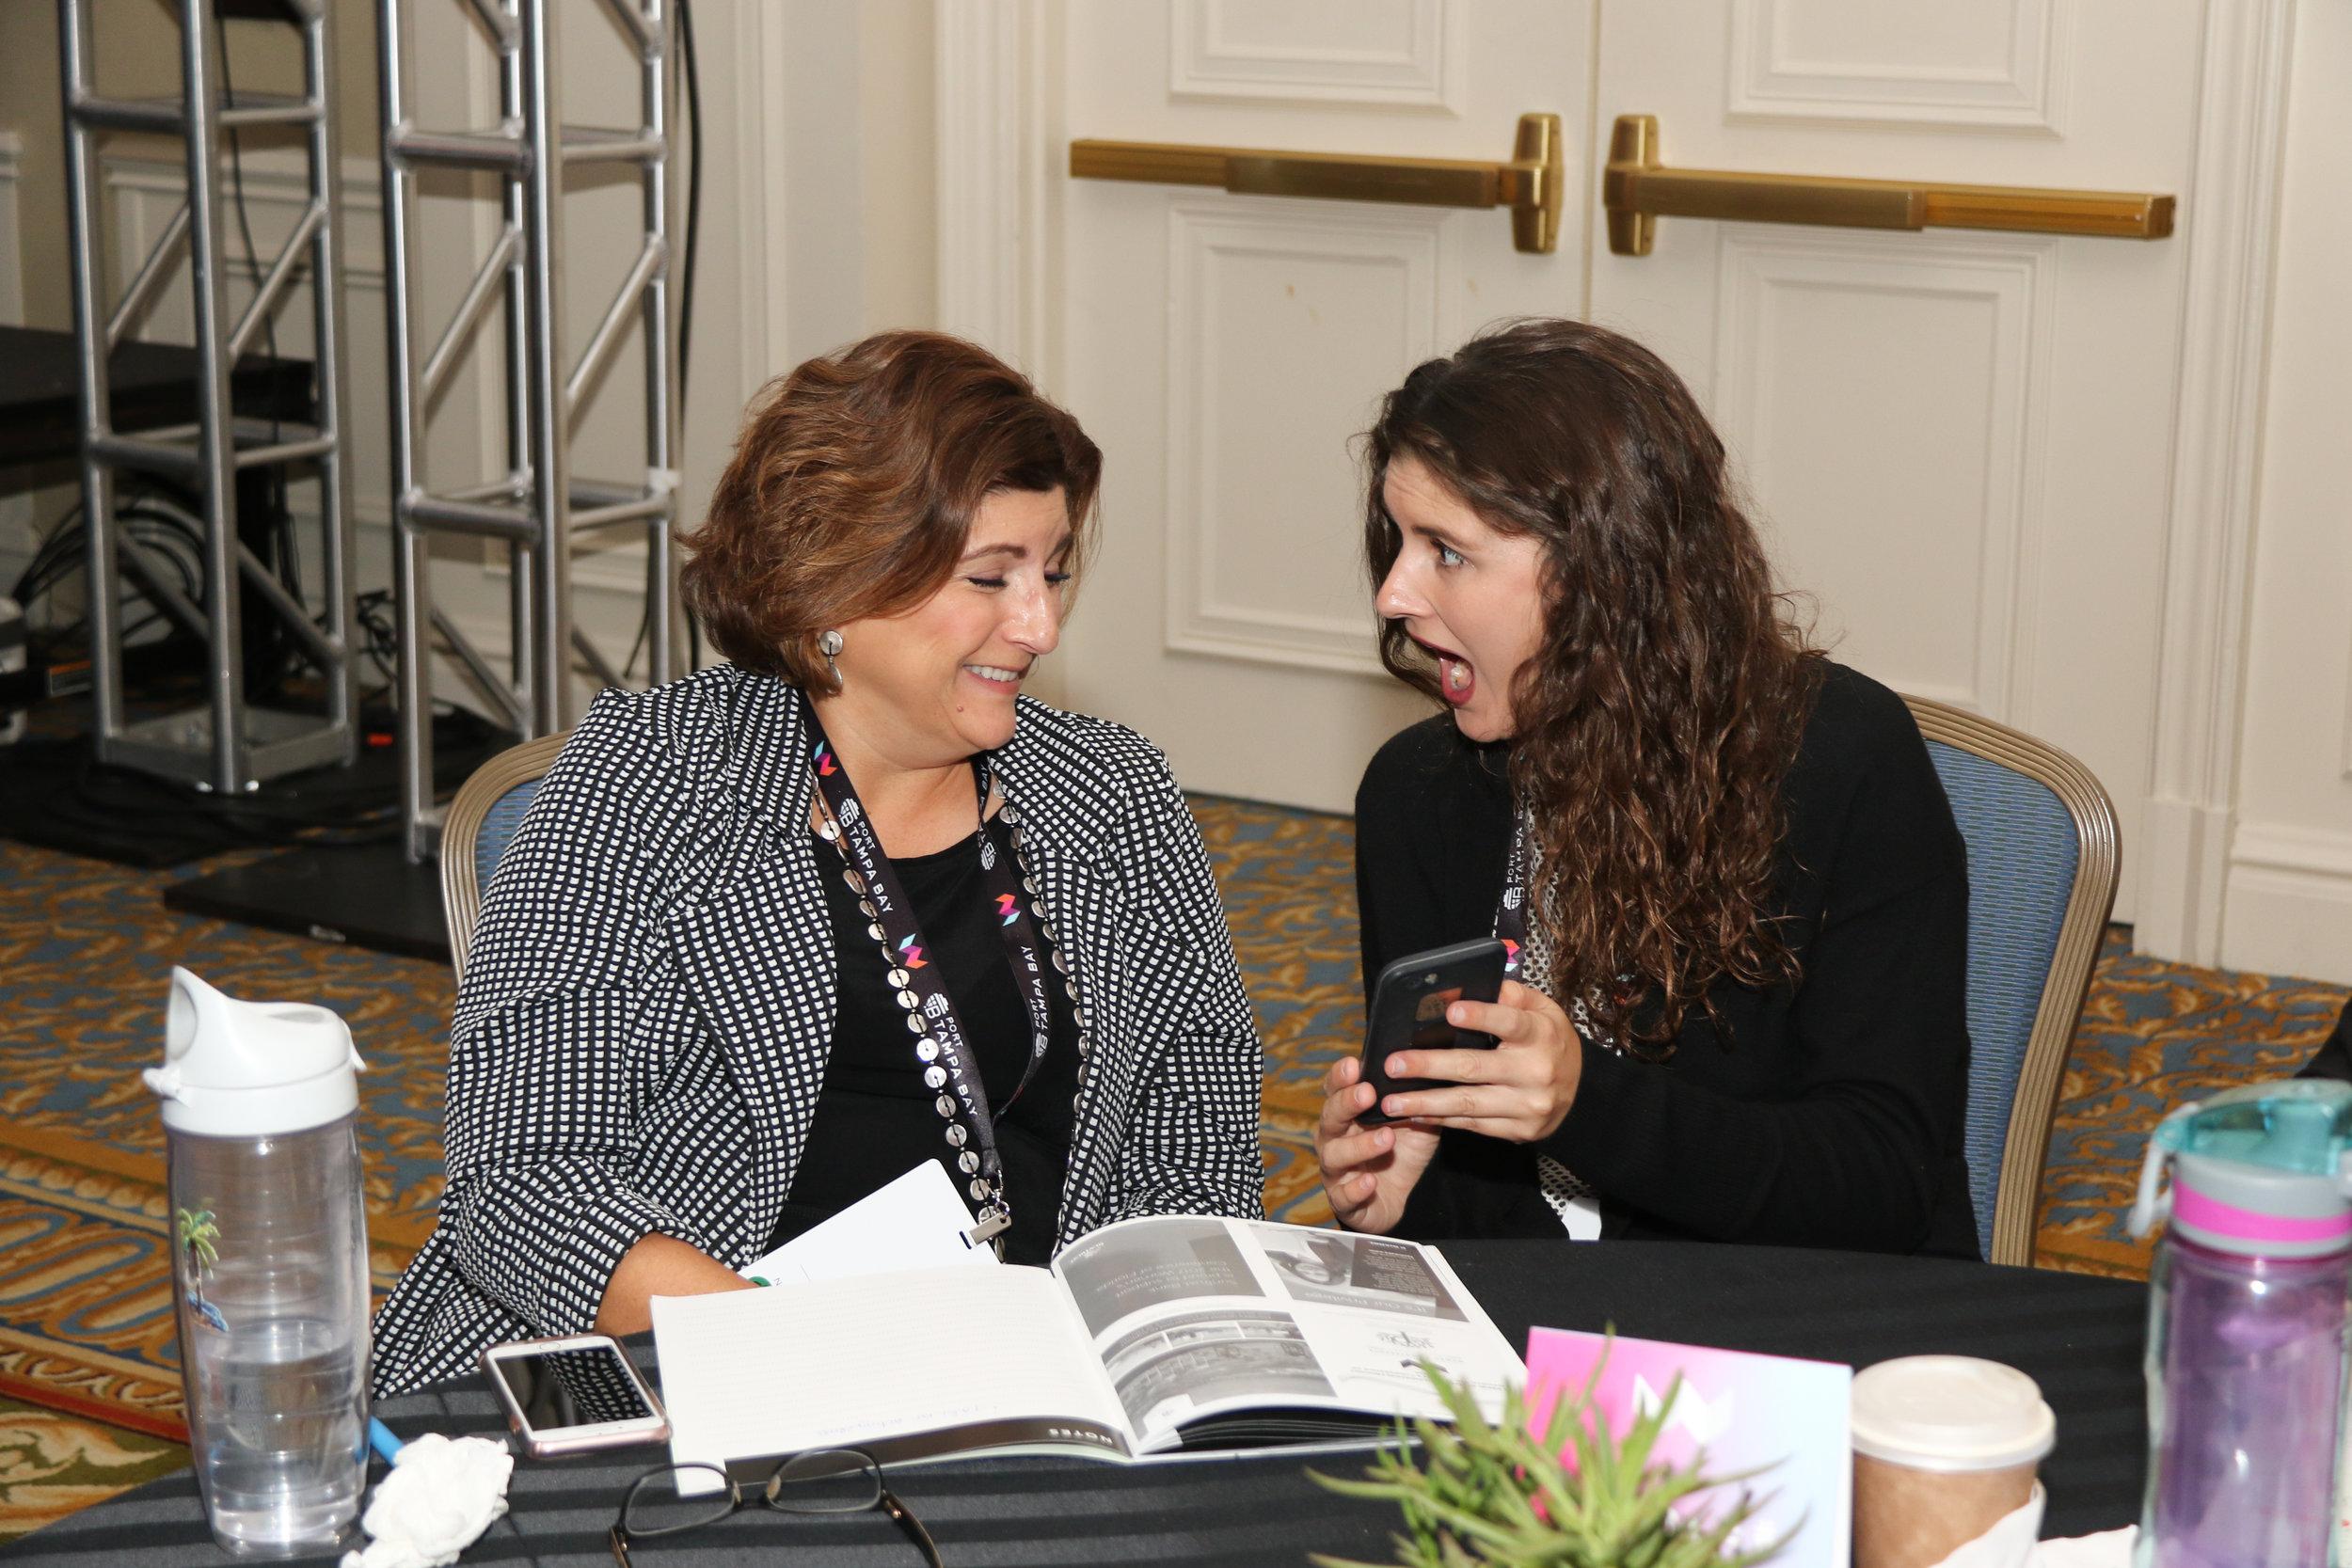 172_WomensConference_10-26-17.jpg